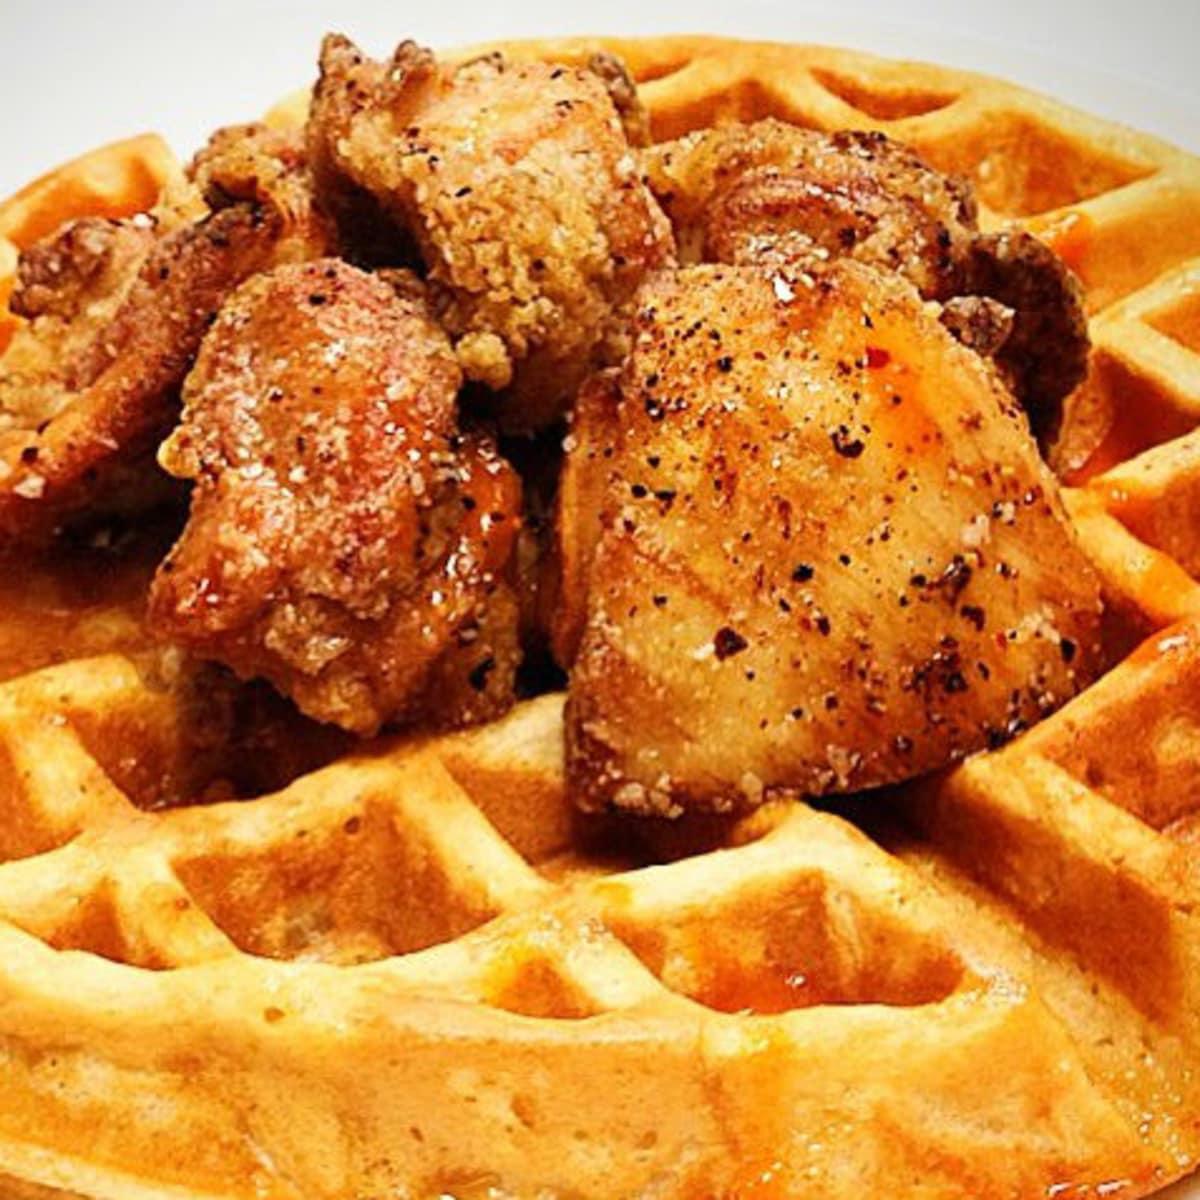 Hightower chicken and waffles